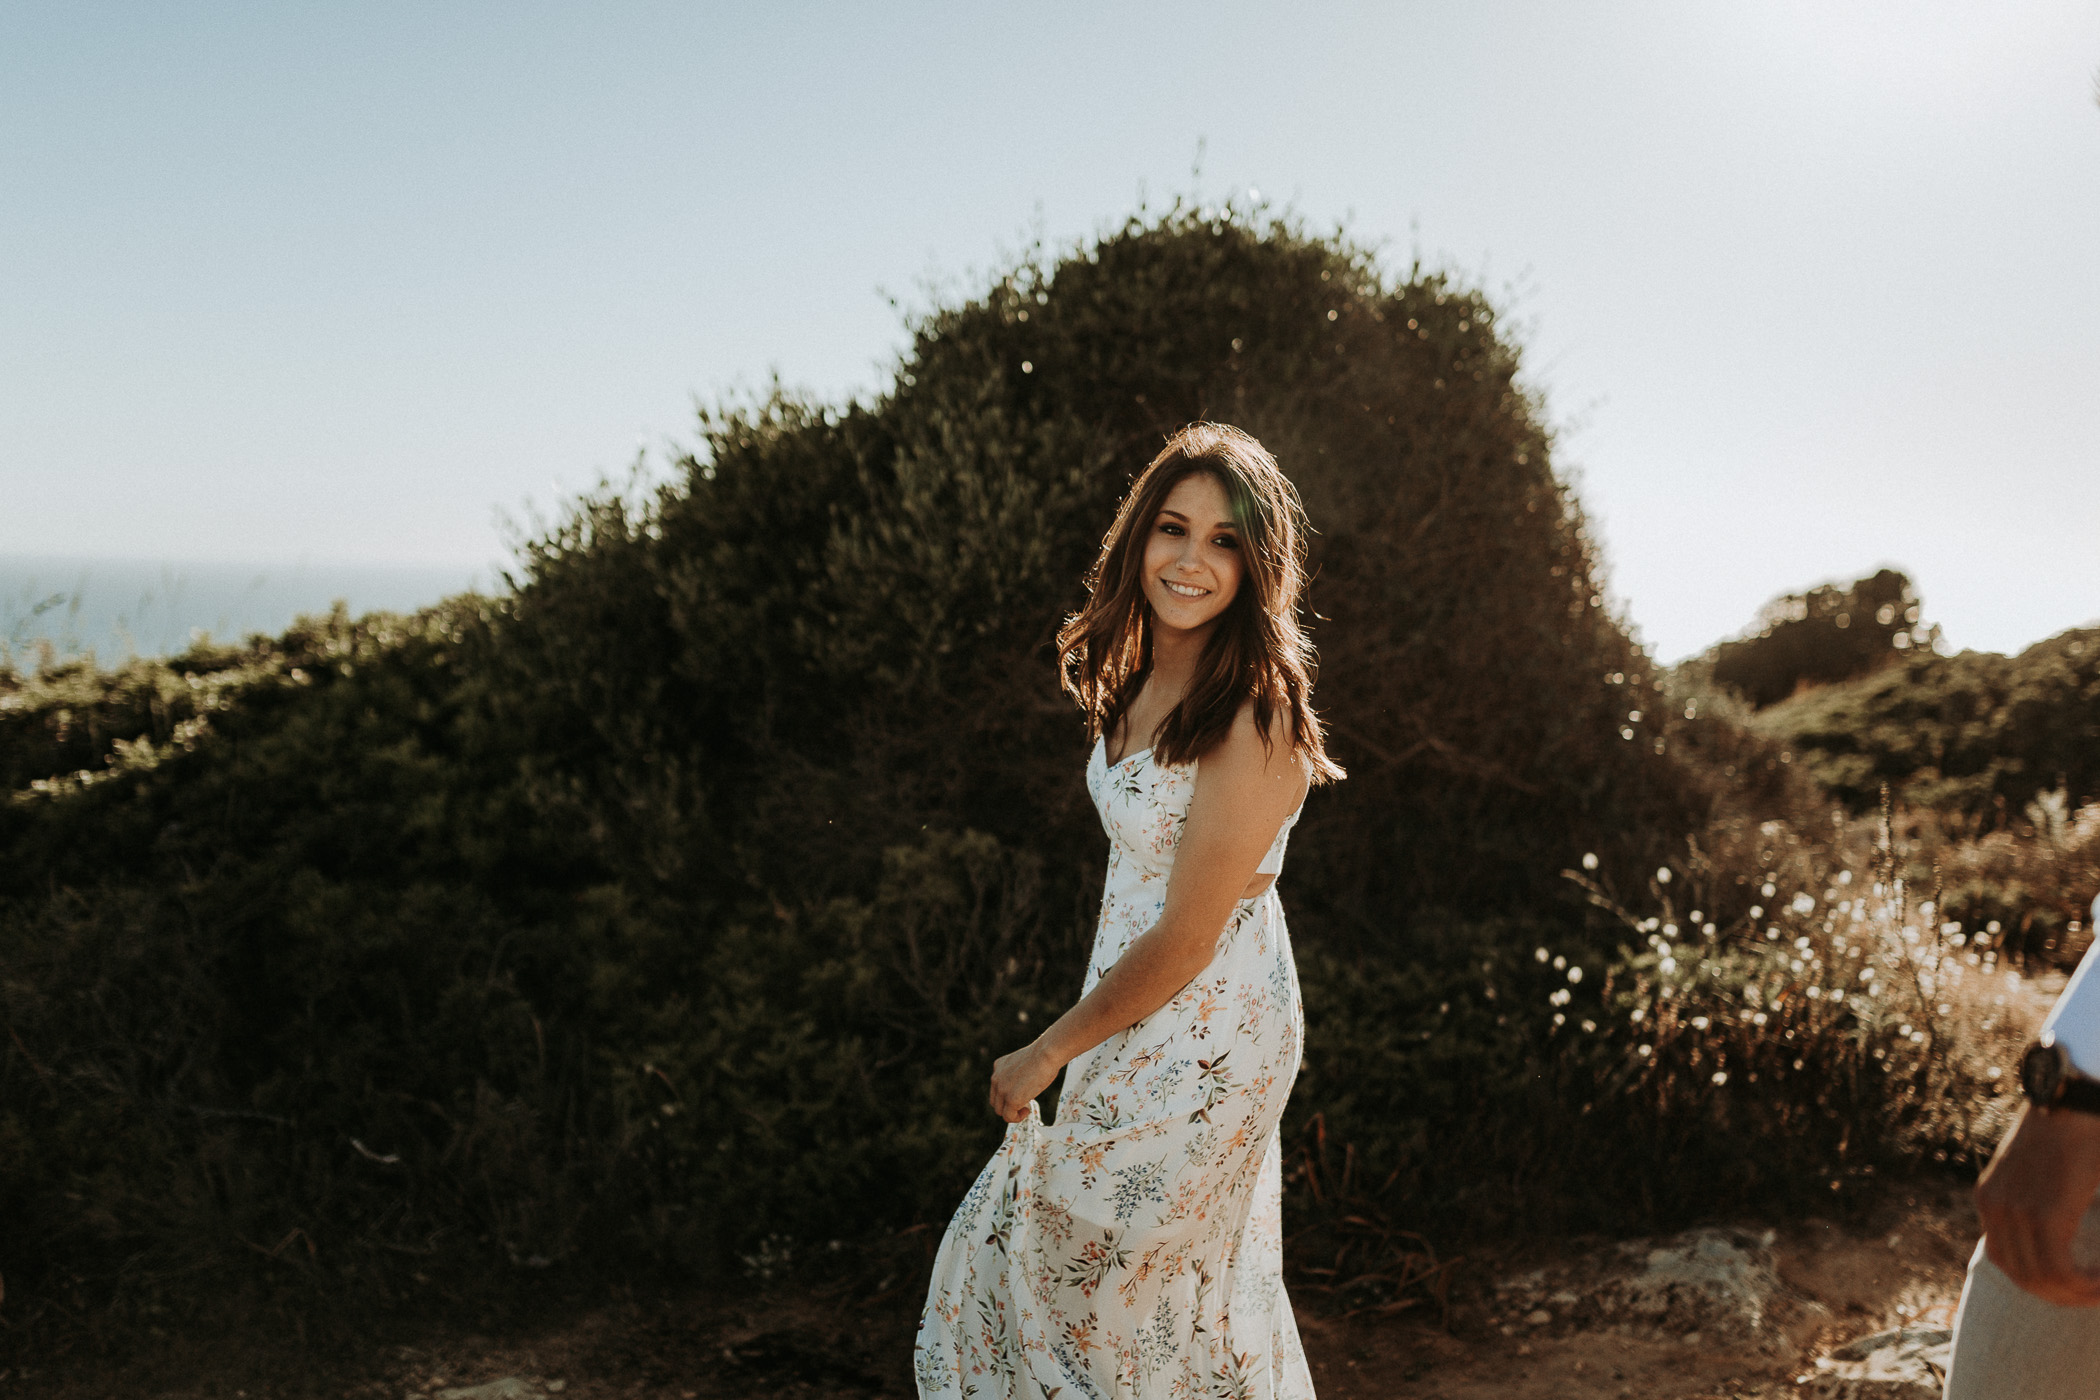 DanielaMarquardtPhotography_wedding_elopement_mallorca_spain_calapi_palma_lauraandtoni_241